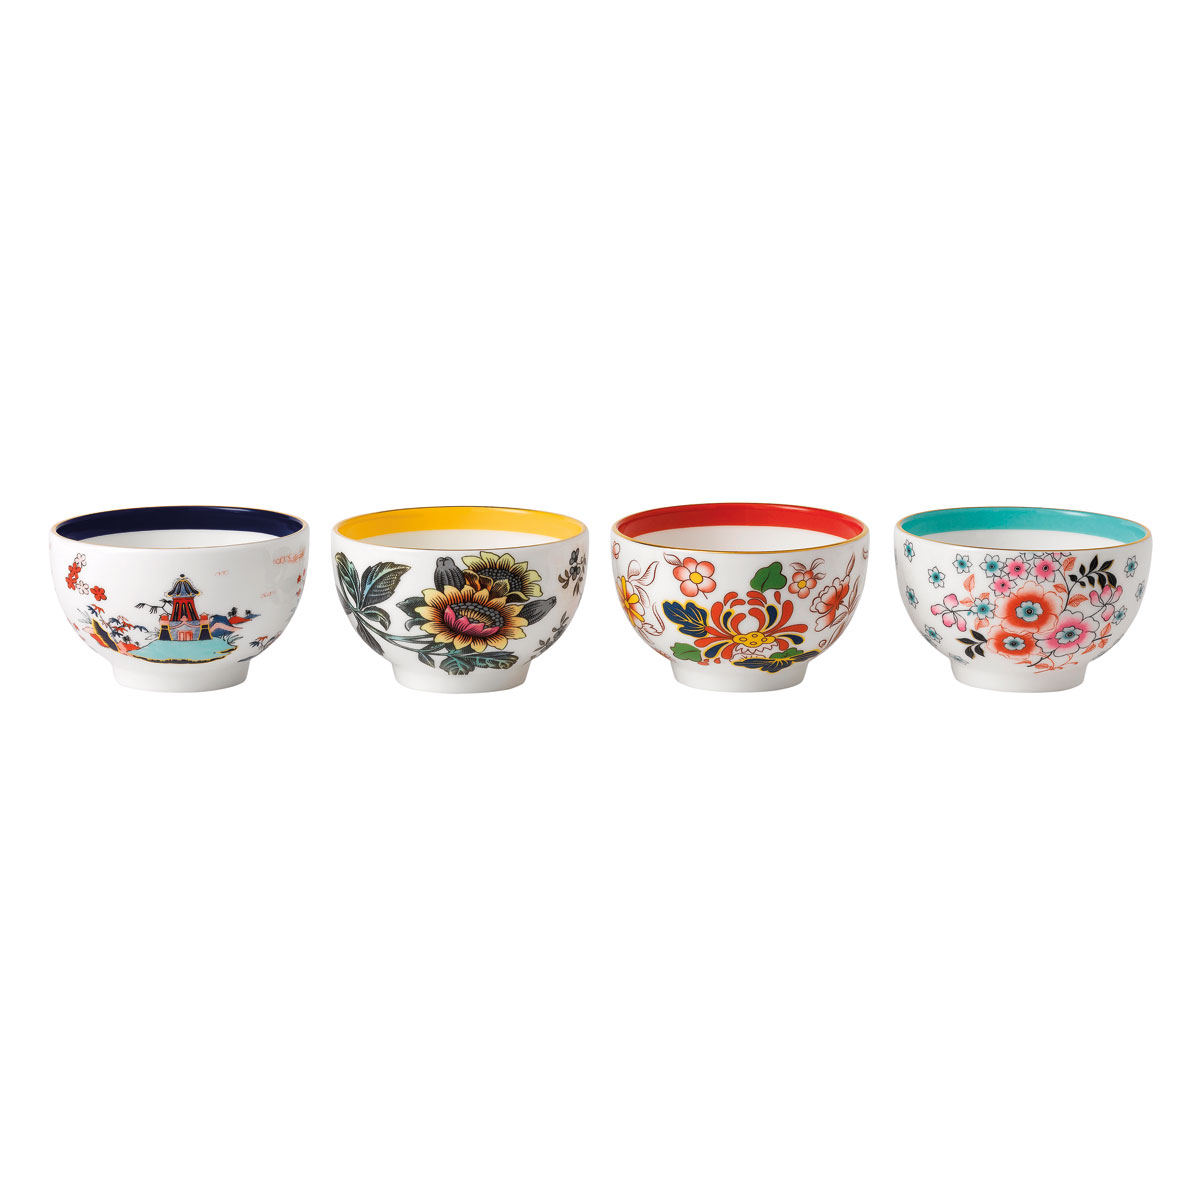 Wedgwood Wonderlust Fine Bone China Tea Bowl, Set of 4, Blue Pagoda, Camellia, Crimson Jewel and Yellow Tonqui